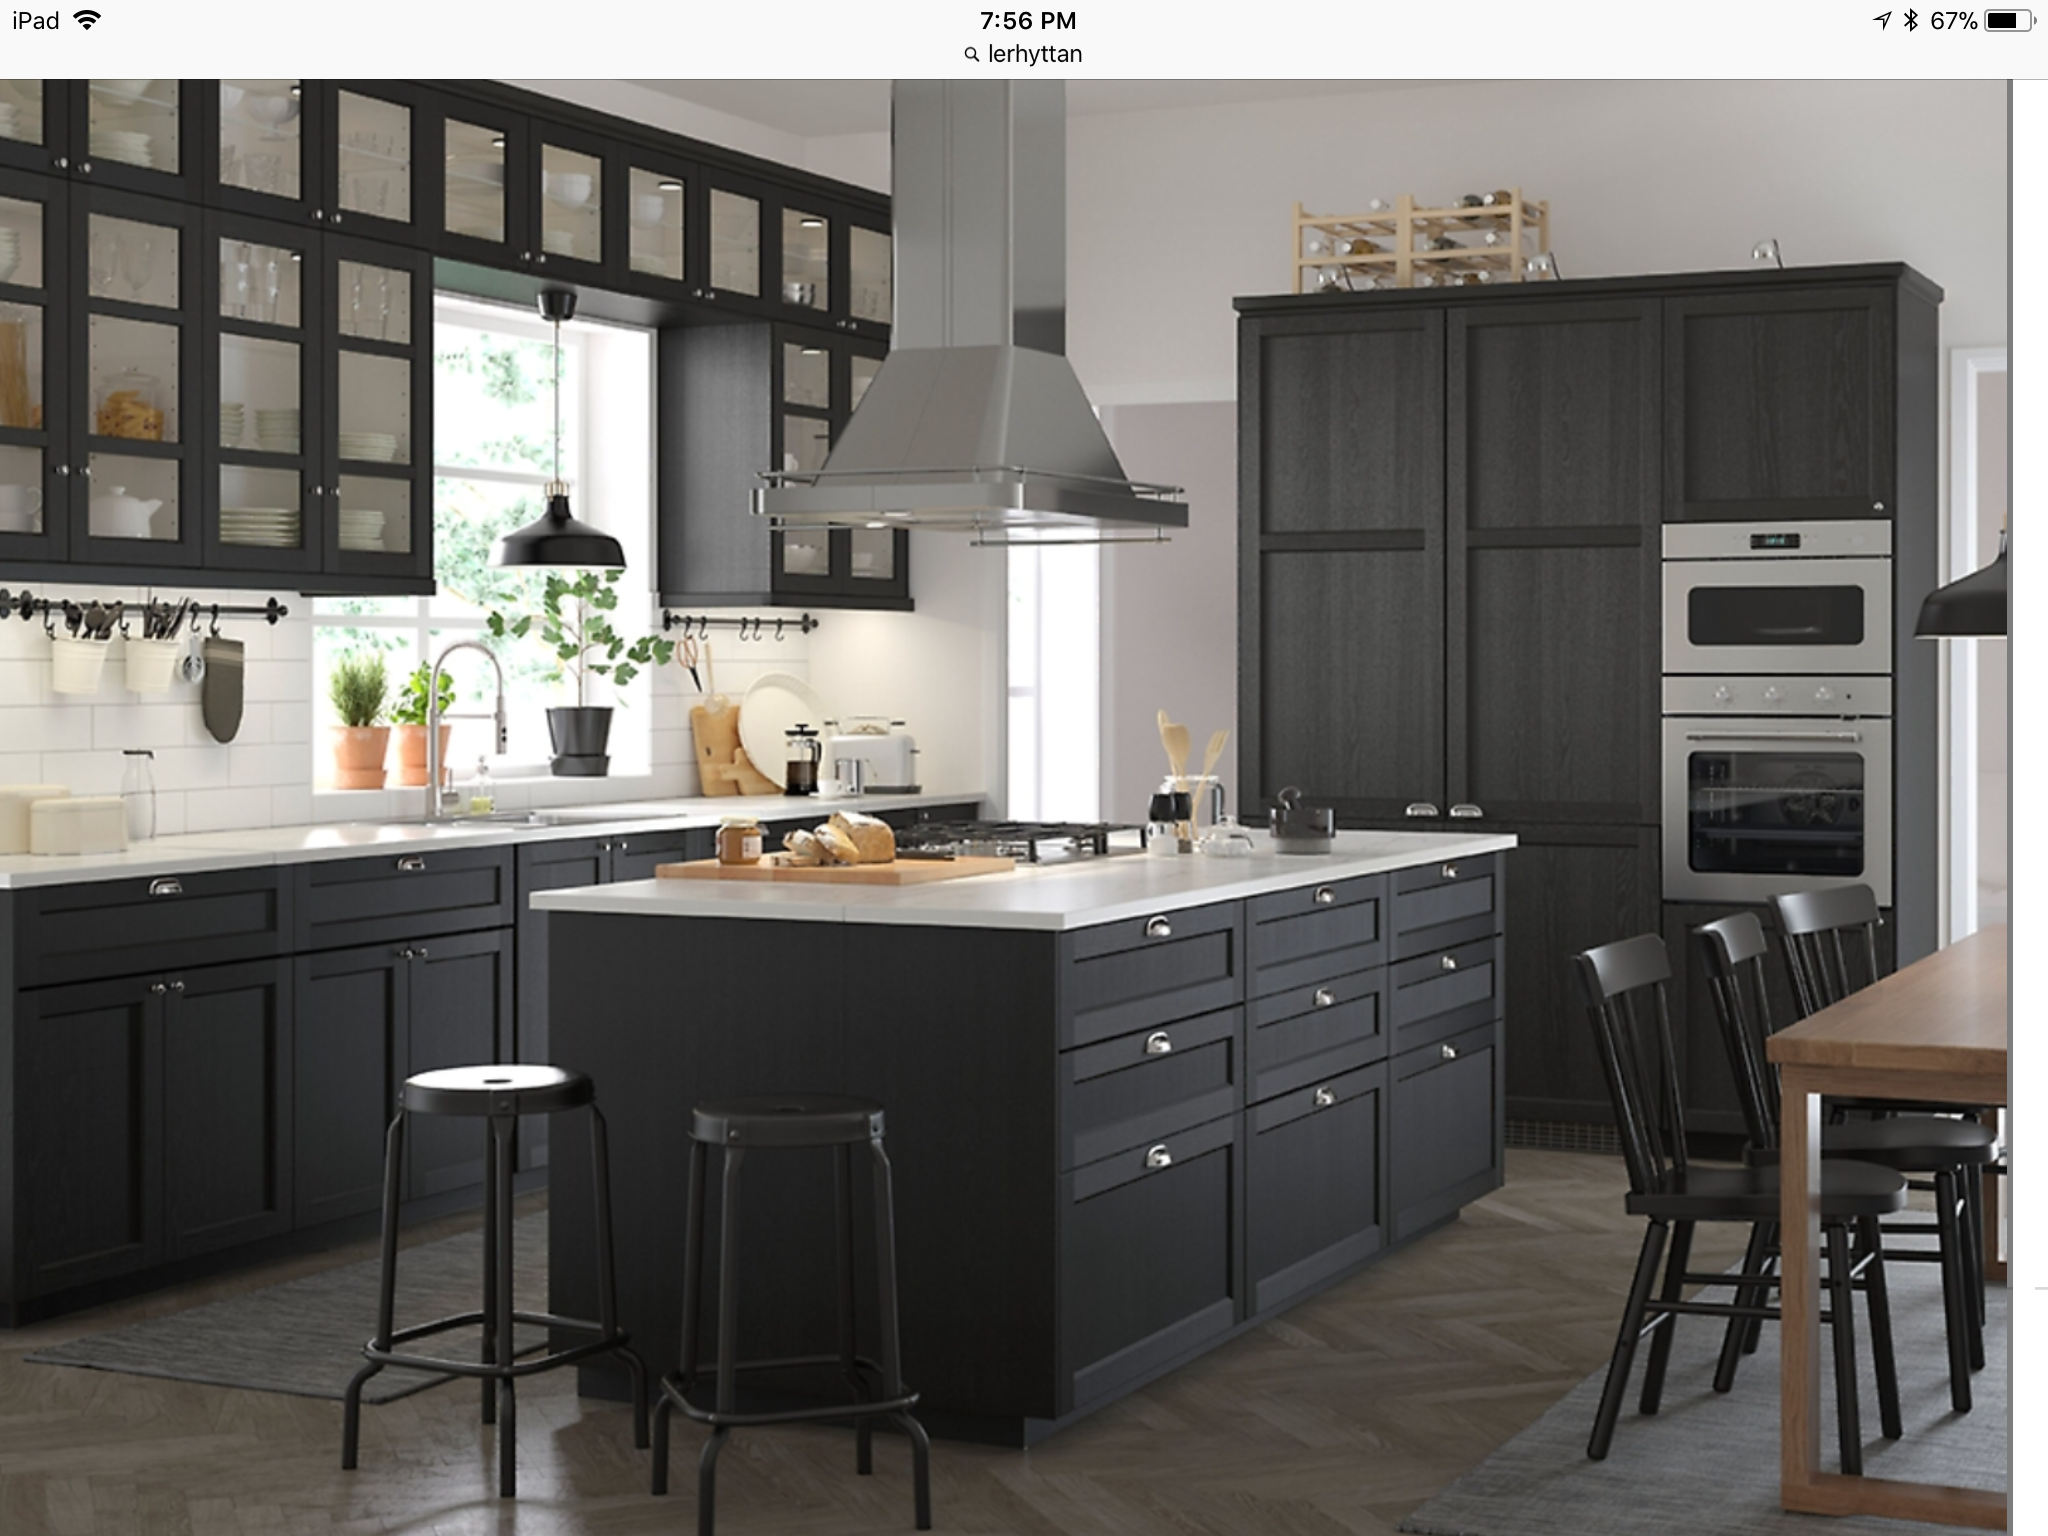 Lerhyttan Ikea Ikea Kitchen Inspiration Kitchen Design